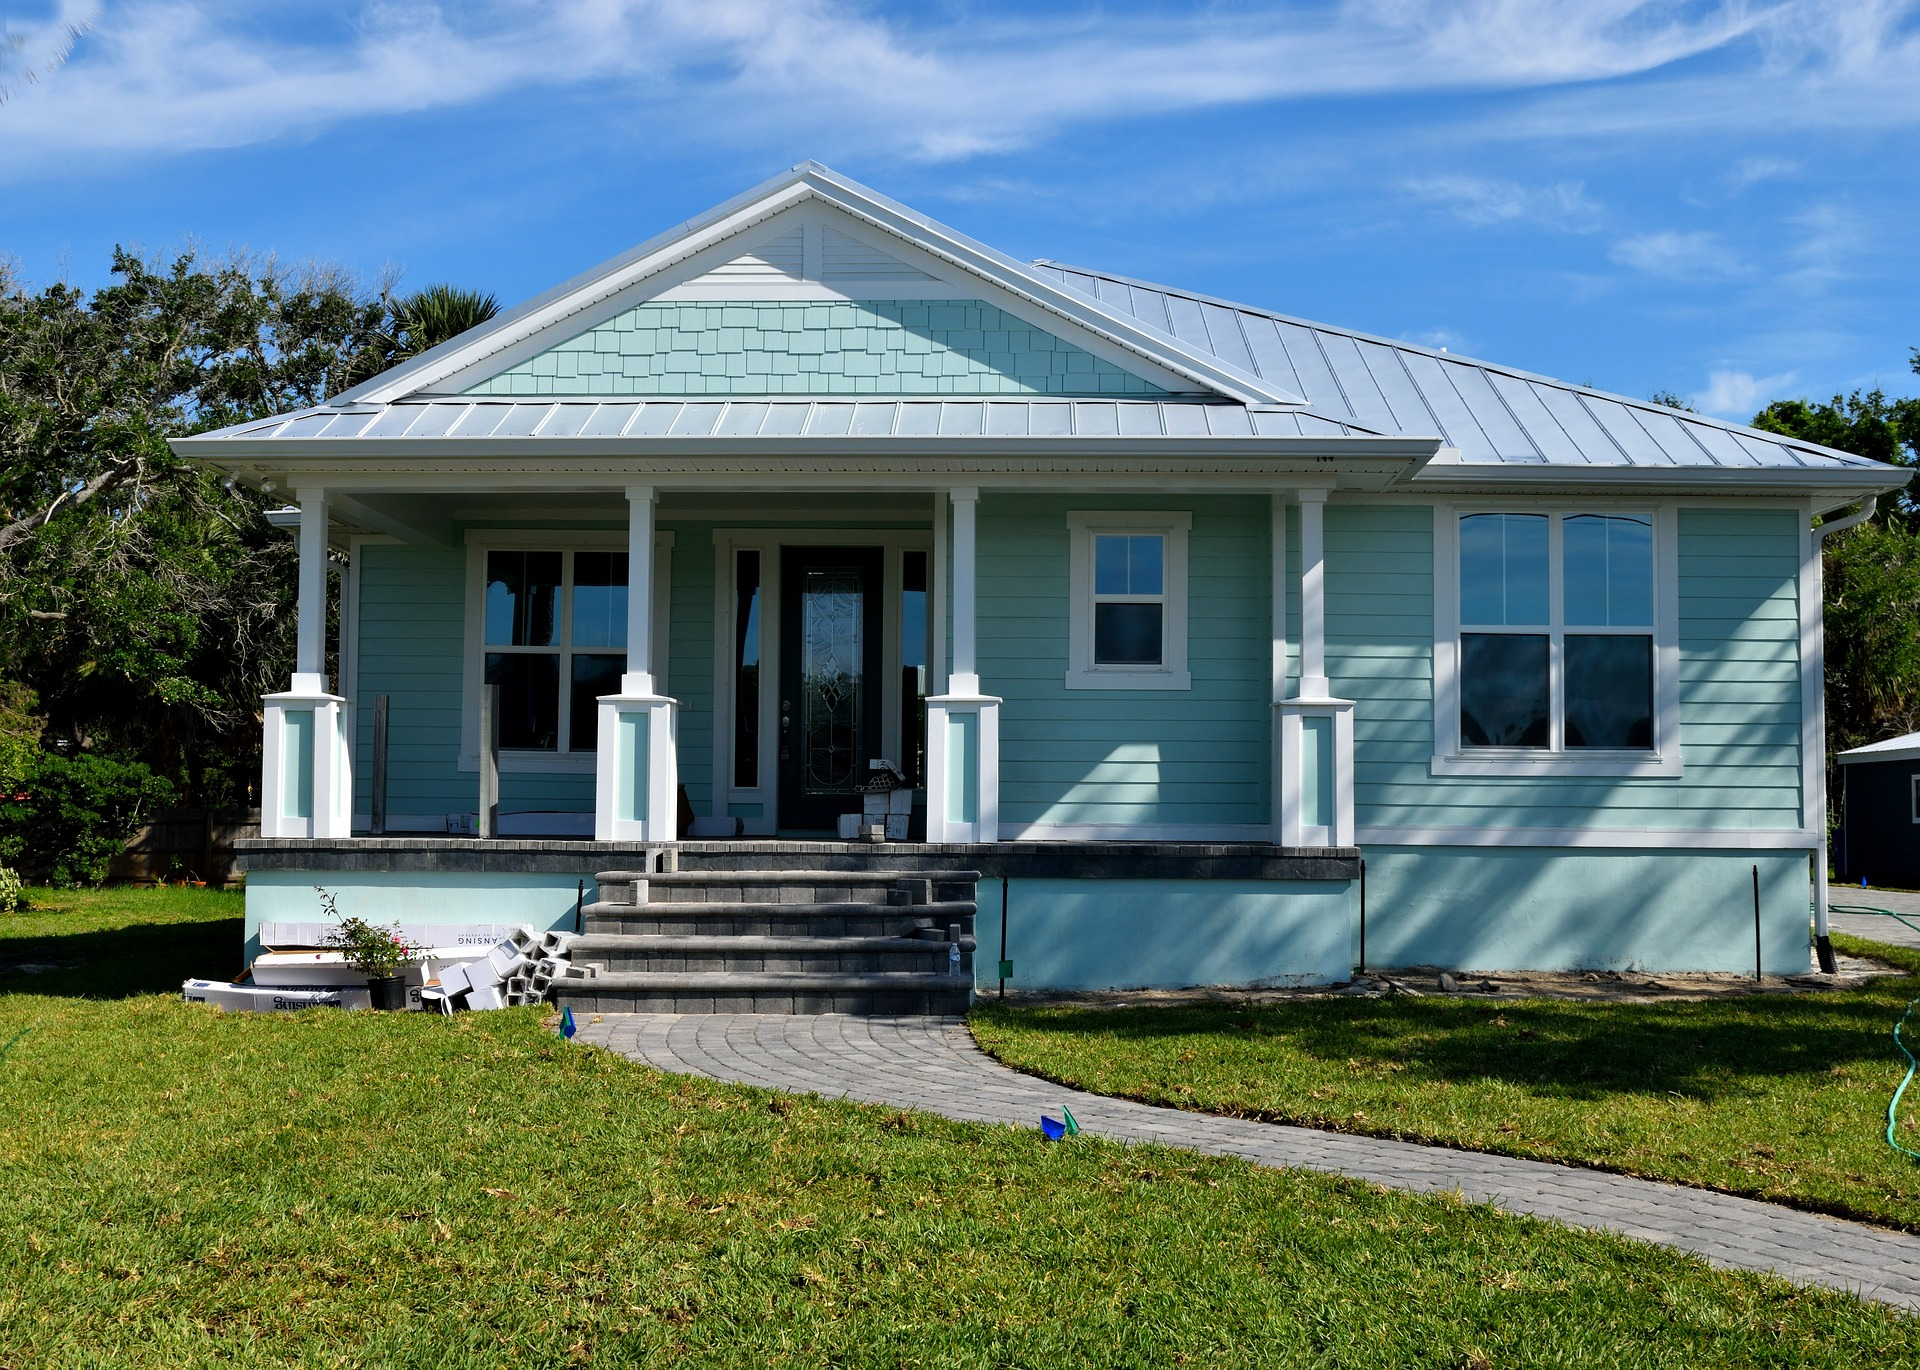 House 3362676 1920